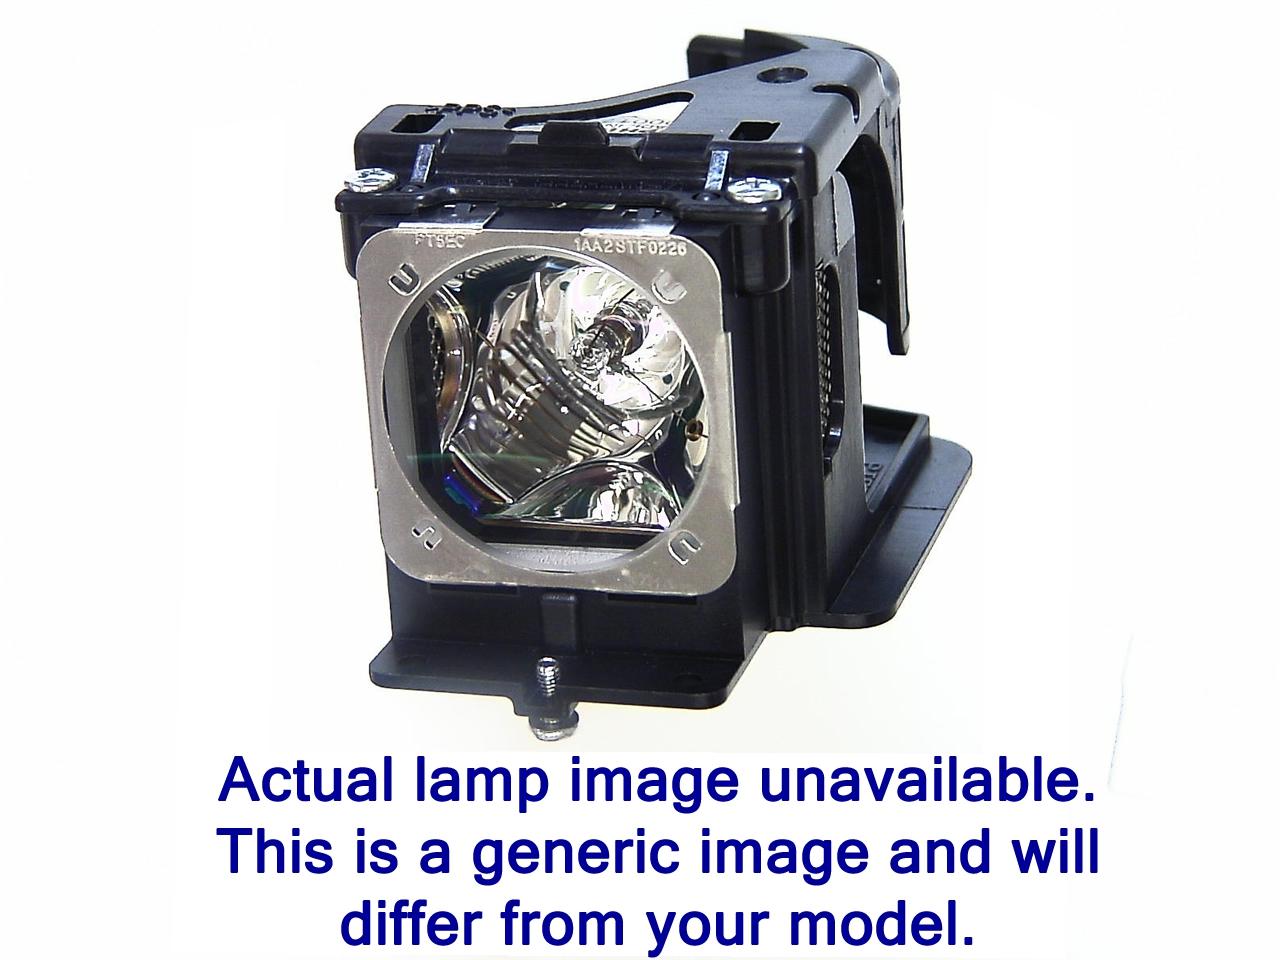 Lámpara RCA HDLP61W151YX3